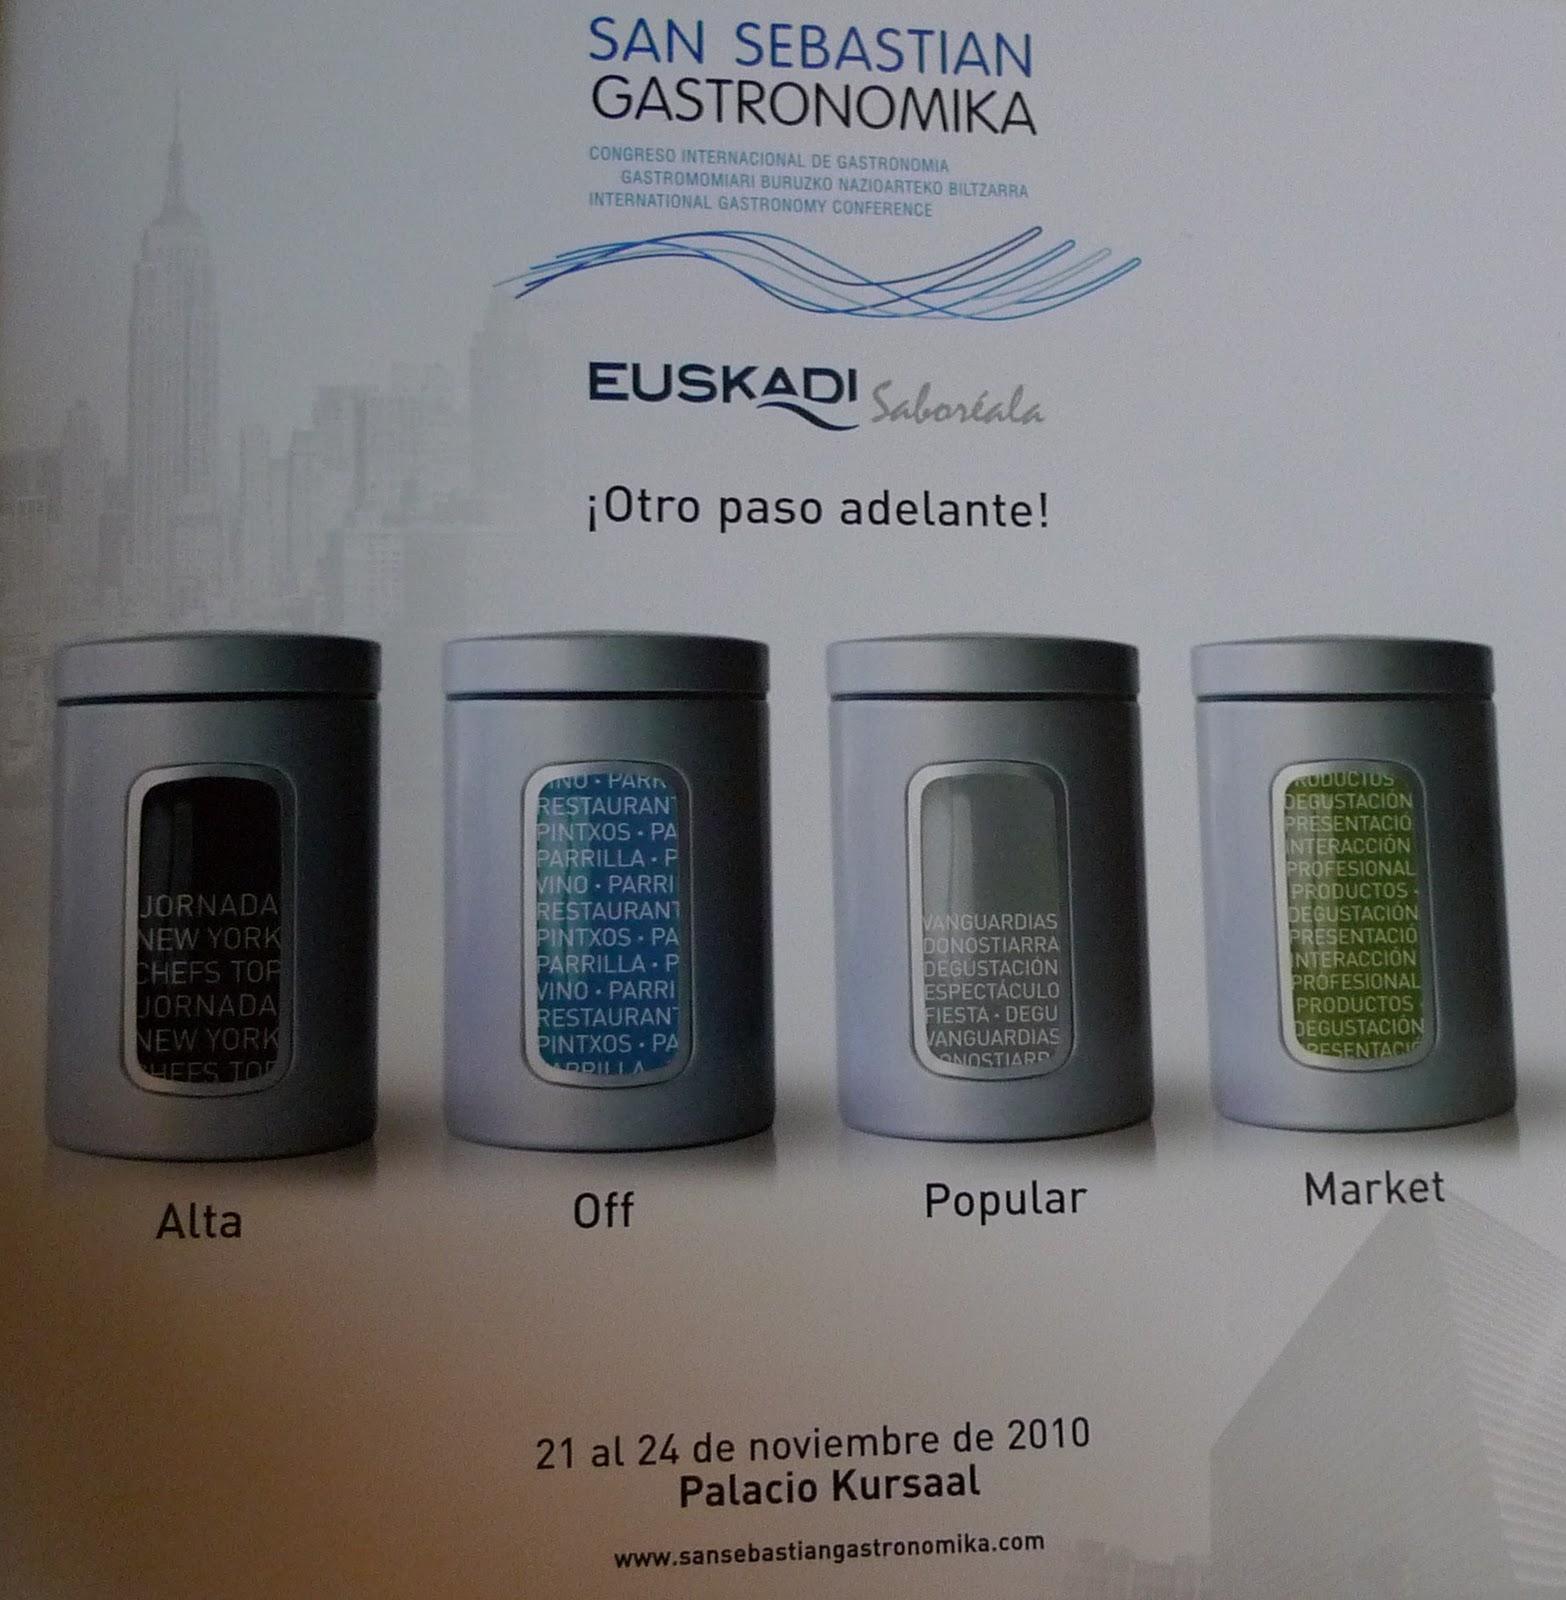 RAC- SOLOMILLO CON COMPOTA DE CEBOLLA